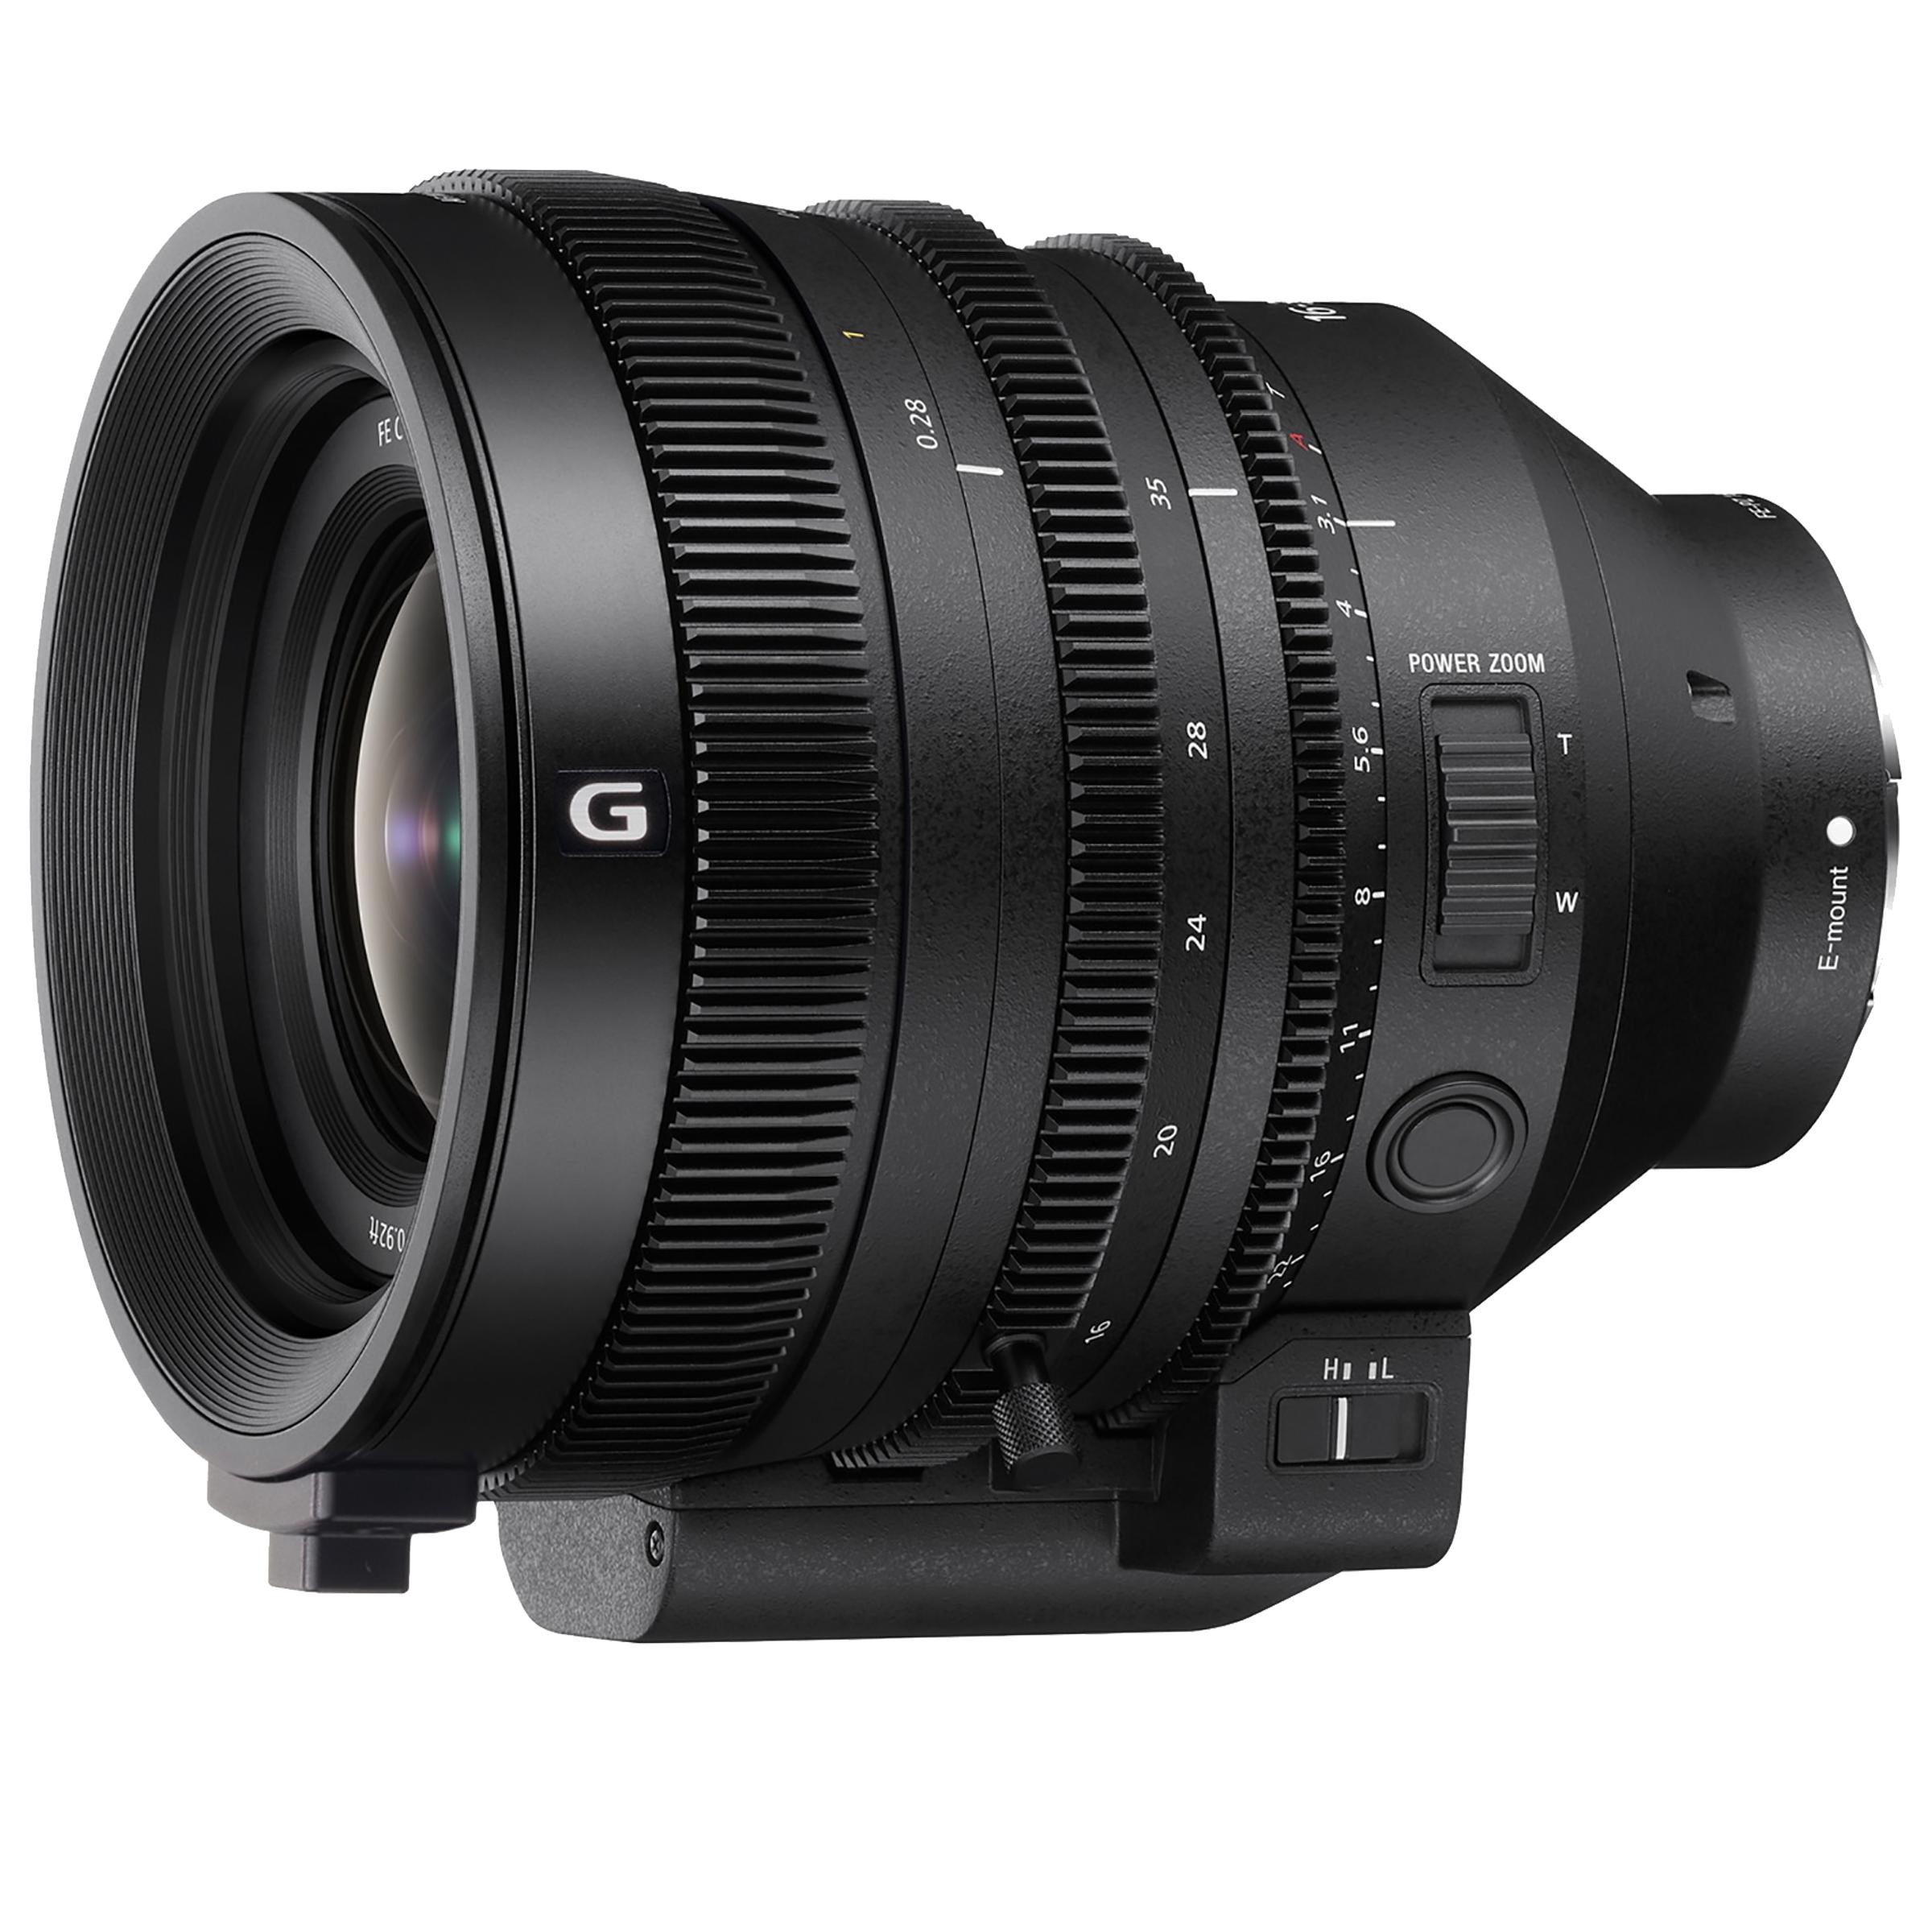 Sony SELC1635G 16-35 mm f/2.8 Telephoto Lens (Responsive Manual Control, 94643380, Black)_1